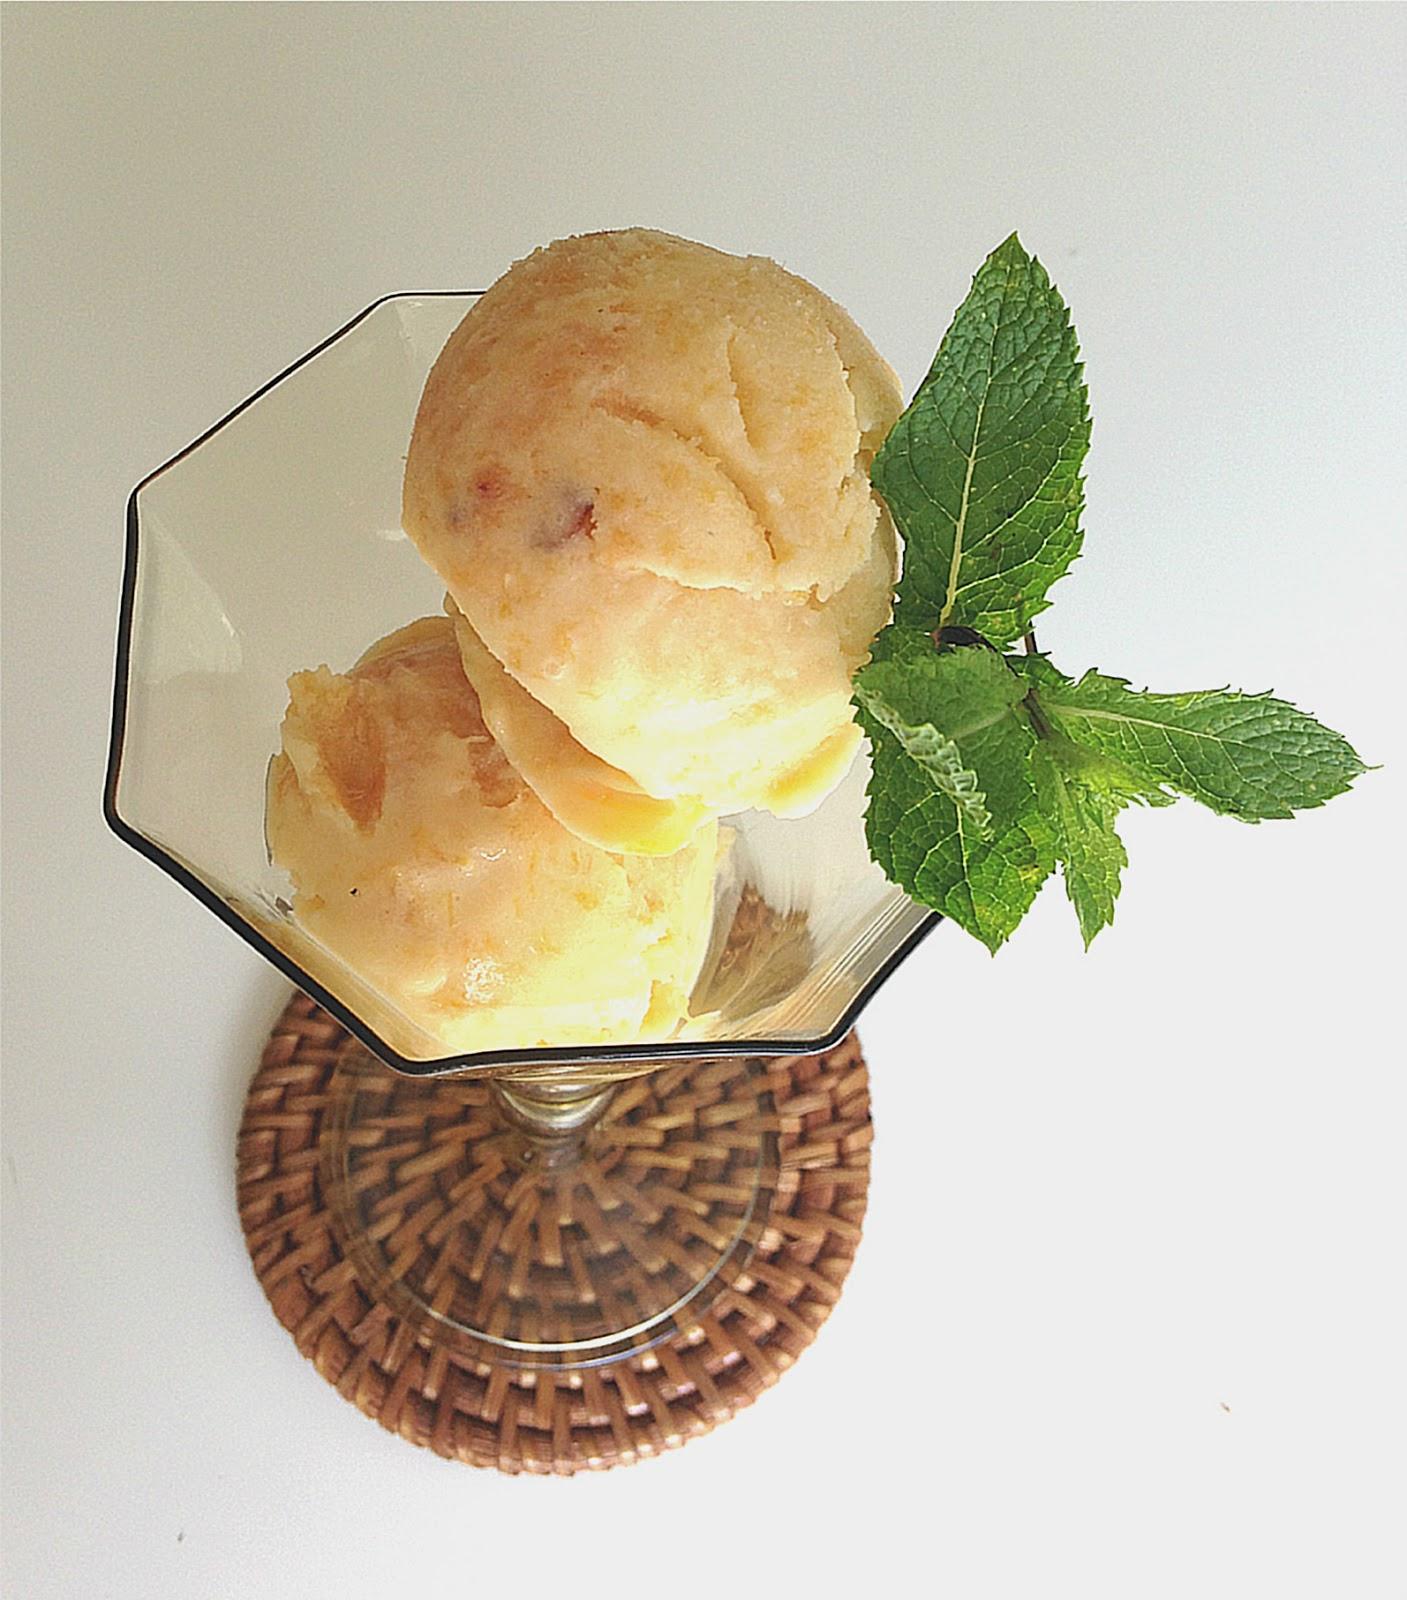 ice pops recipe yummly peaches n cream ice pops recipe martha stewart ...